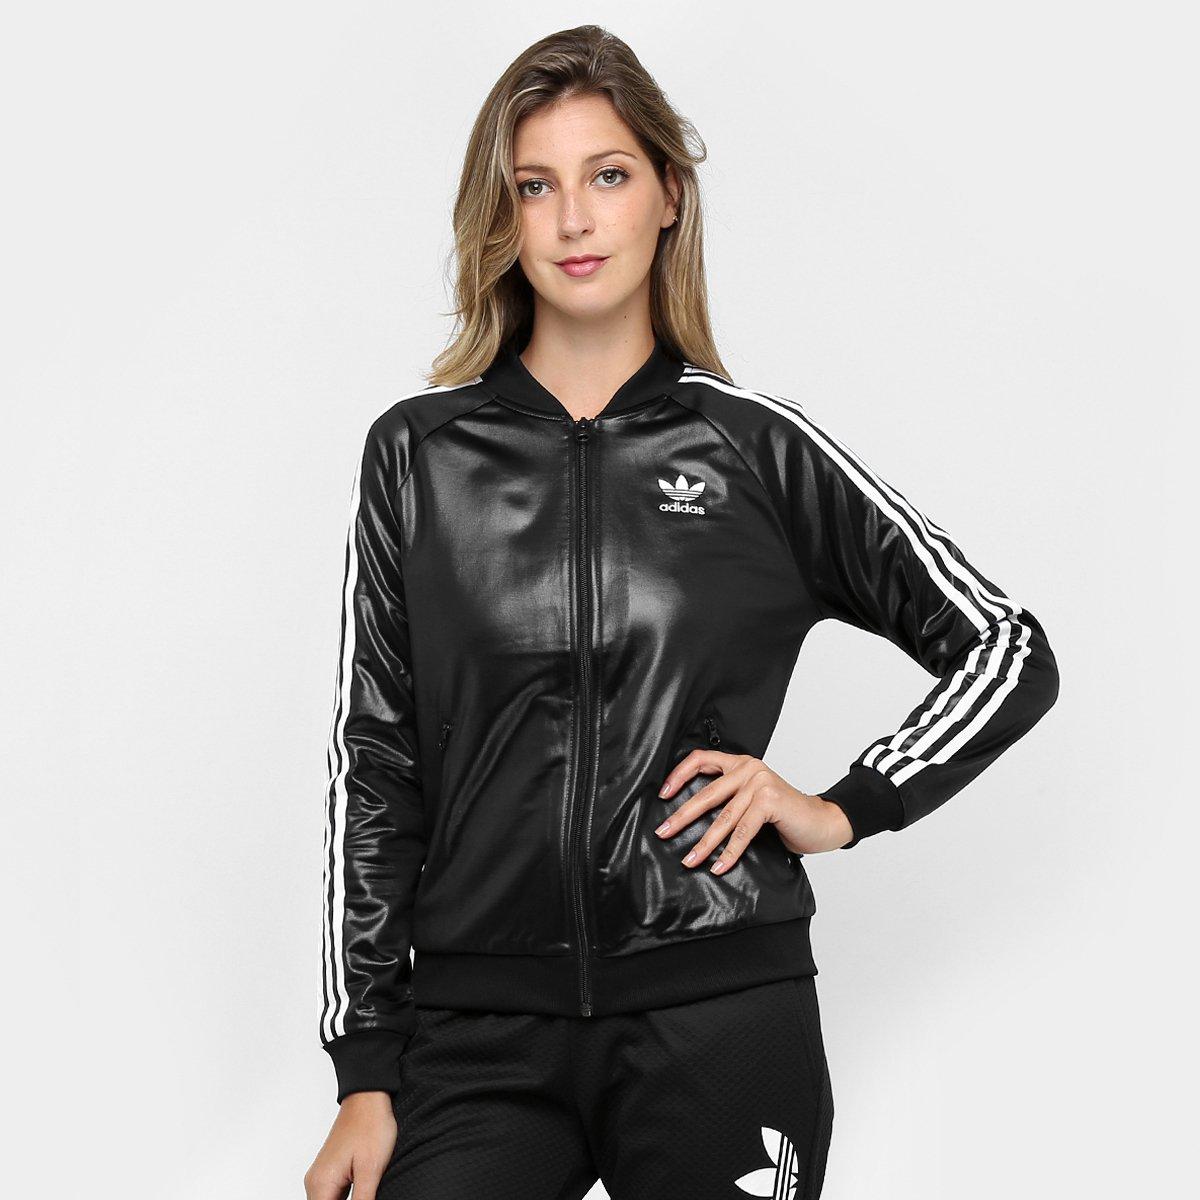 c10fd3ca5b6 Jaqueta Adidas Sst Tt - Compre Agora